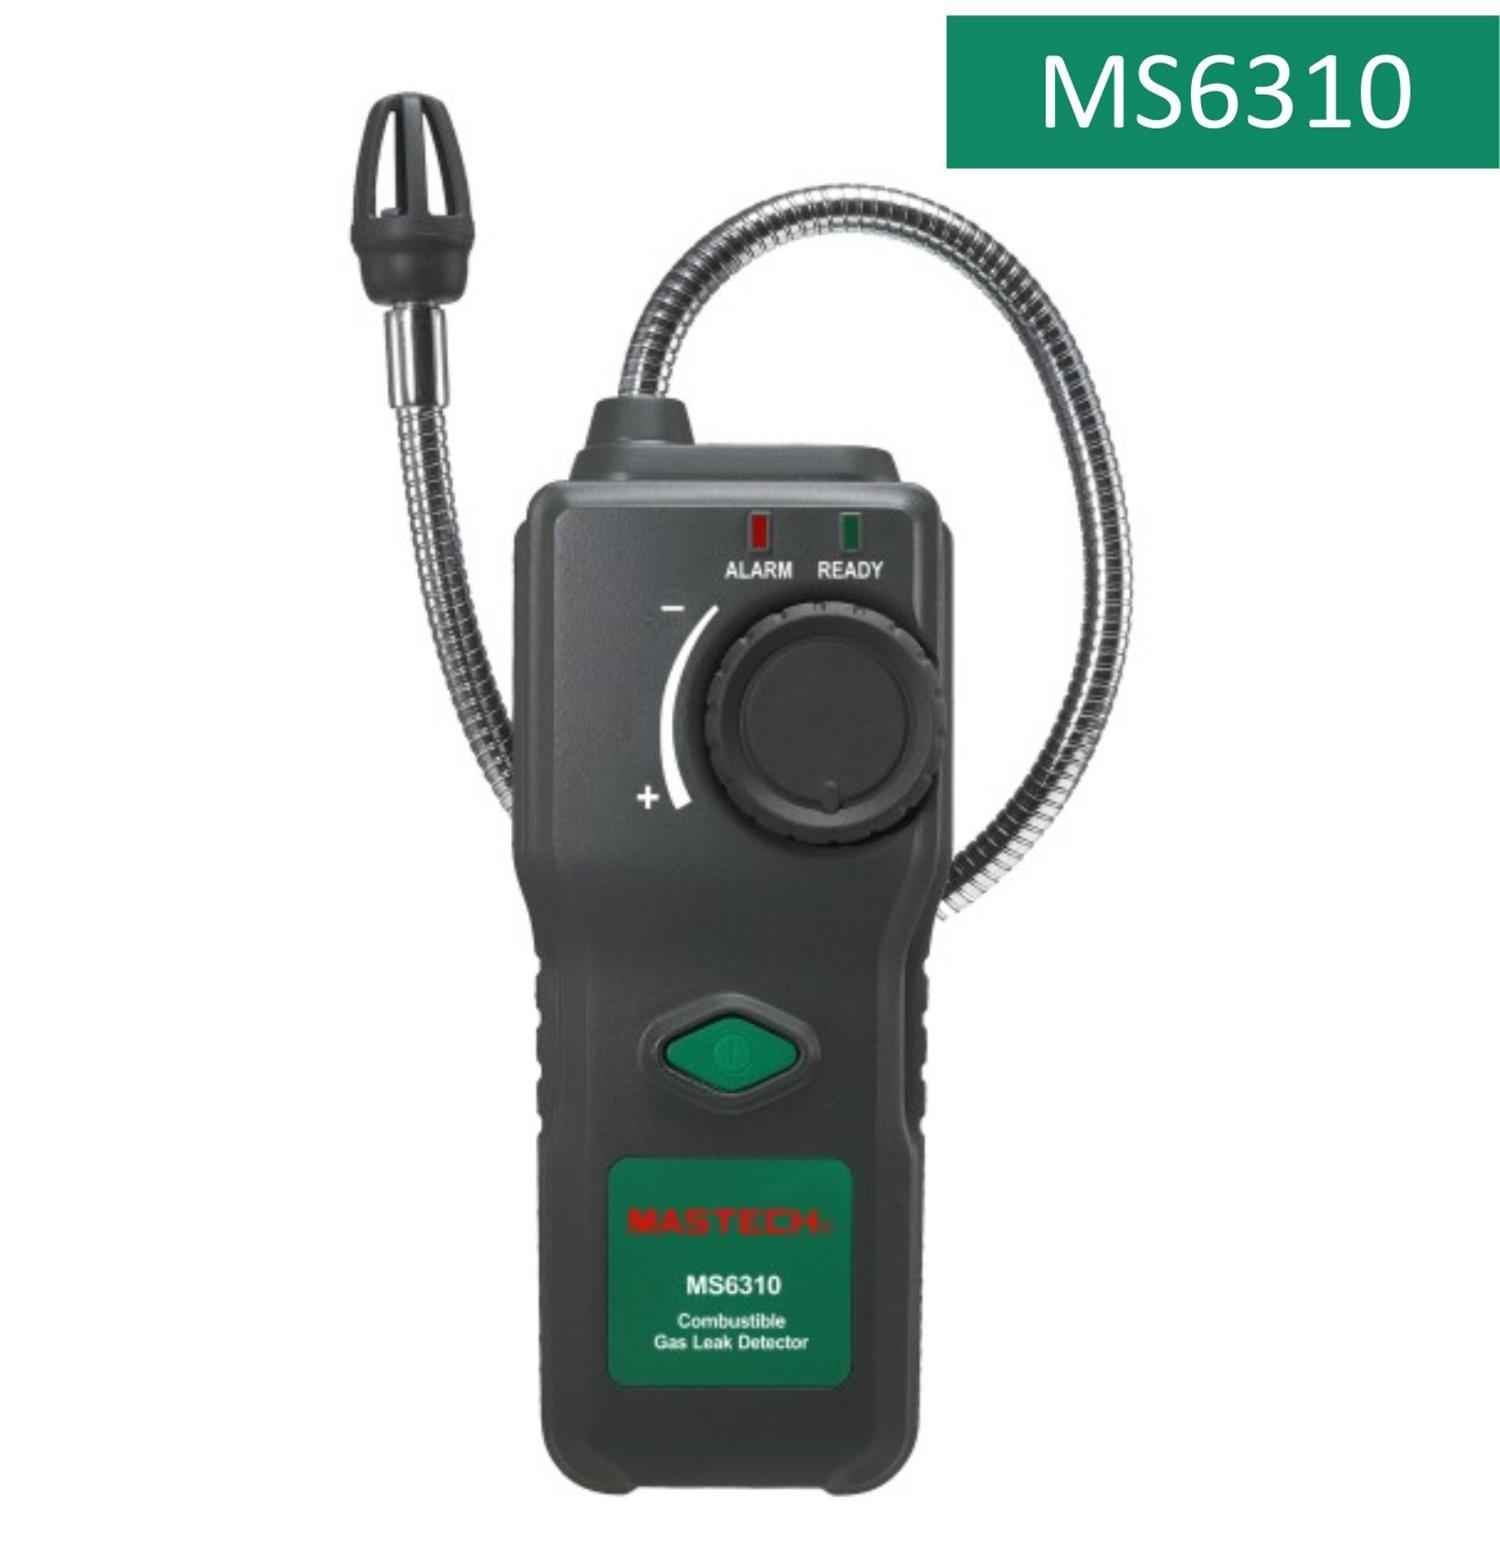 MS6310